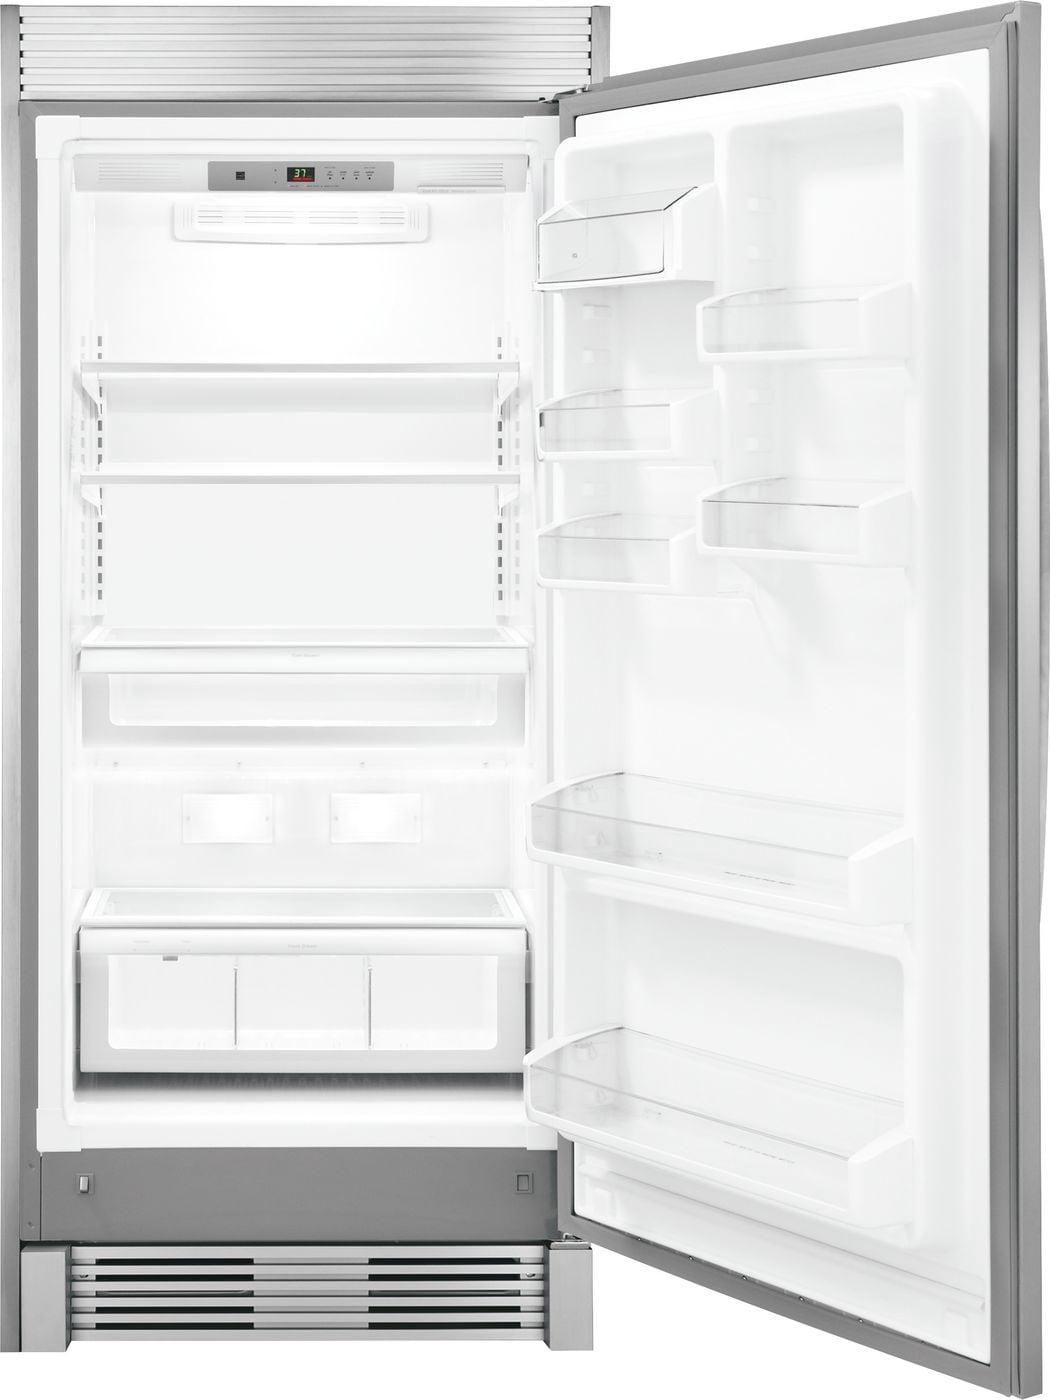 Model: FGRU19F6QF | Frigidaire Gallery 19 Cu. Ft. Single-Door Refrigerator